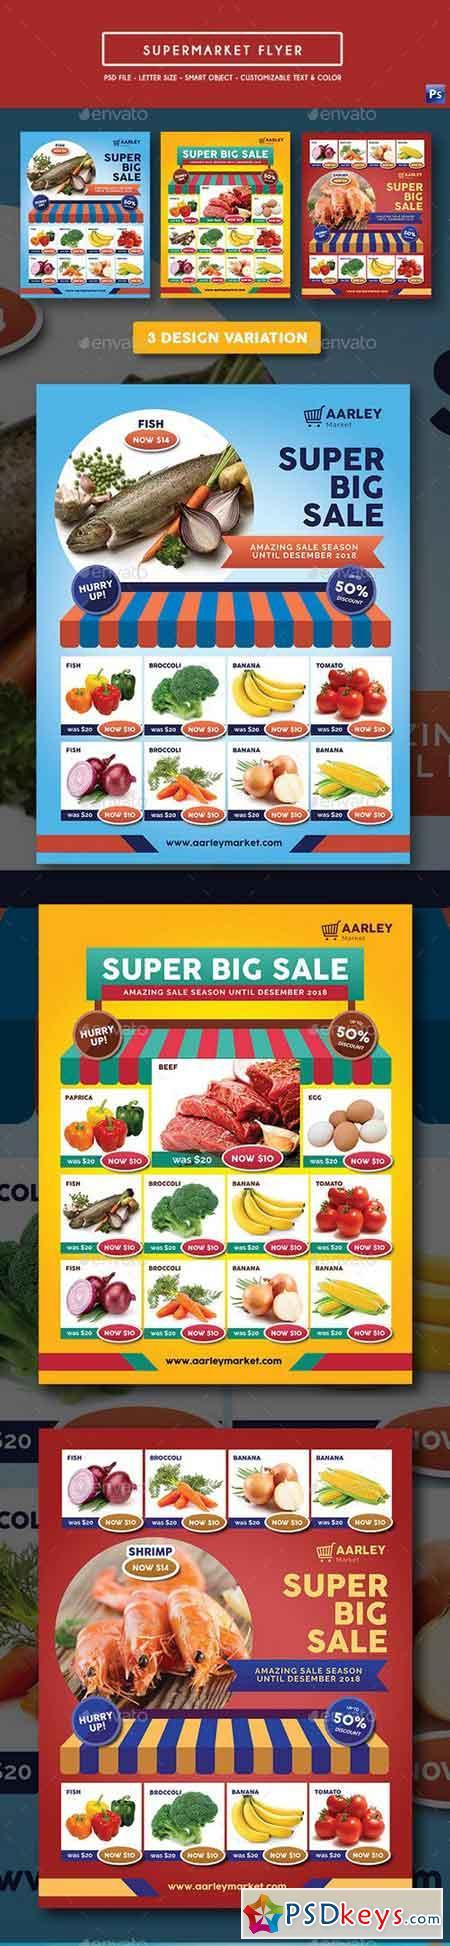 Supermarket Product Promotion Flyer 19621928